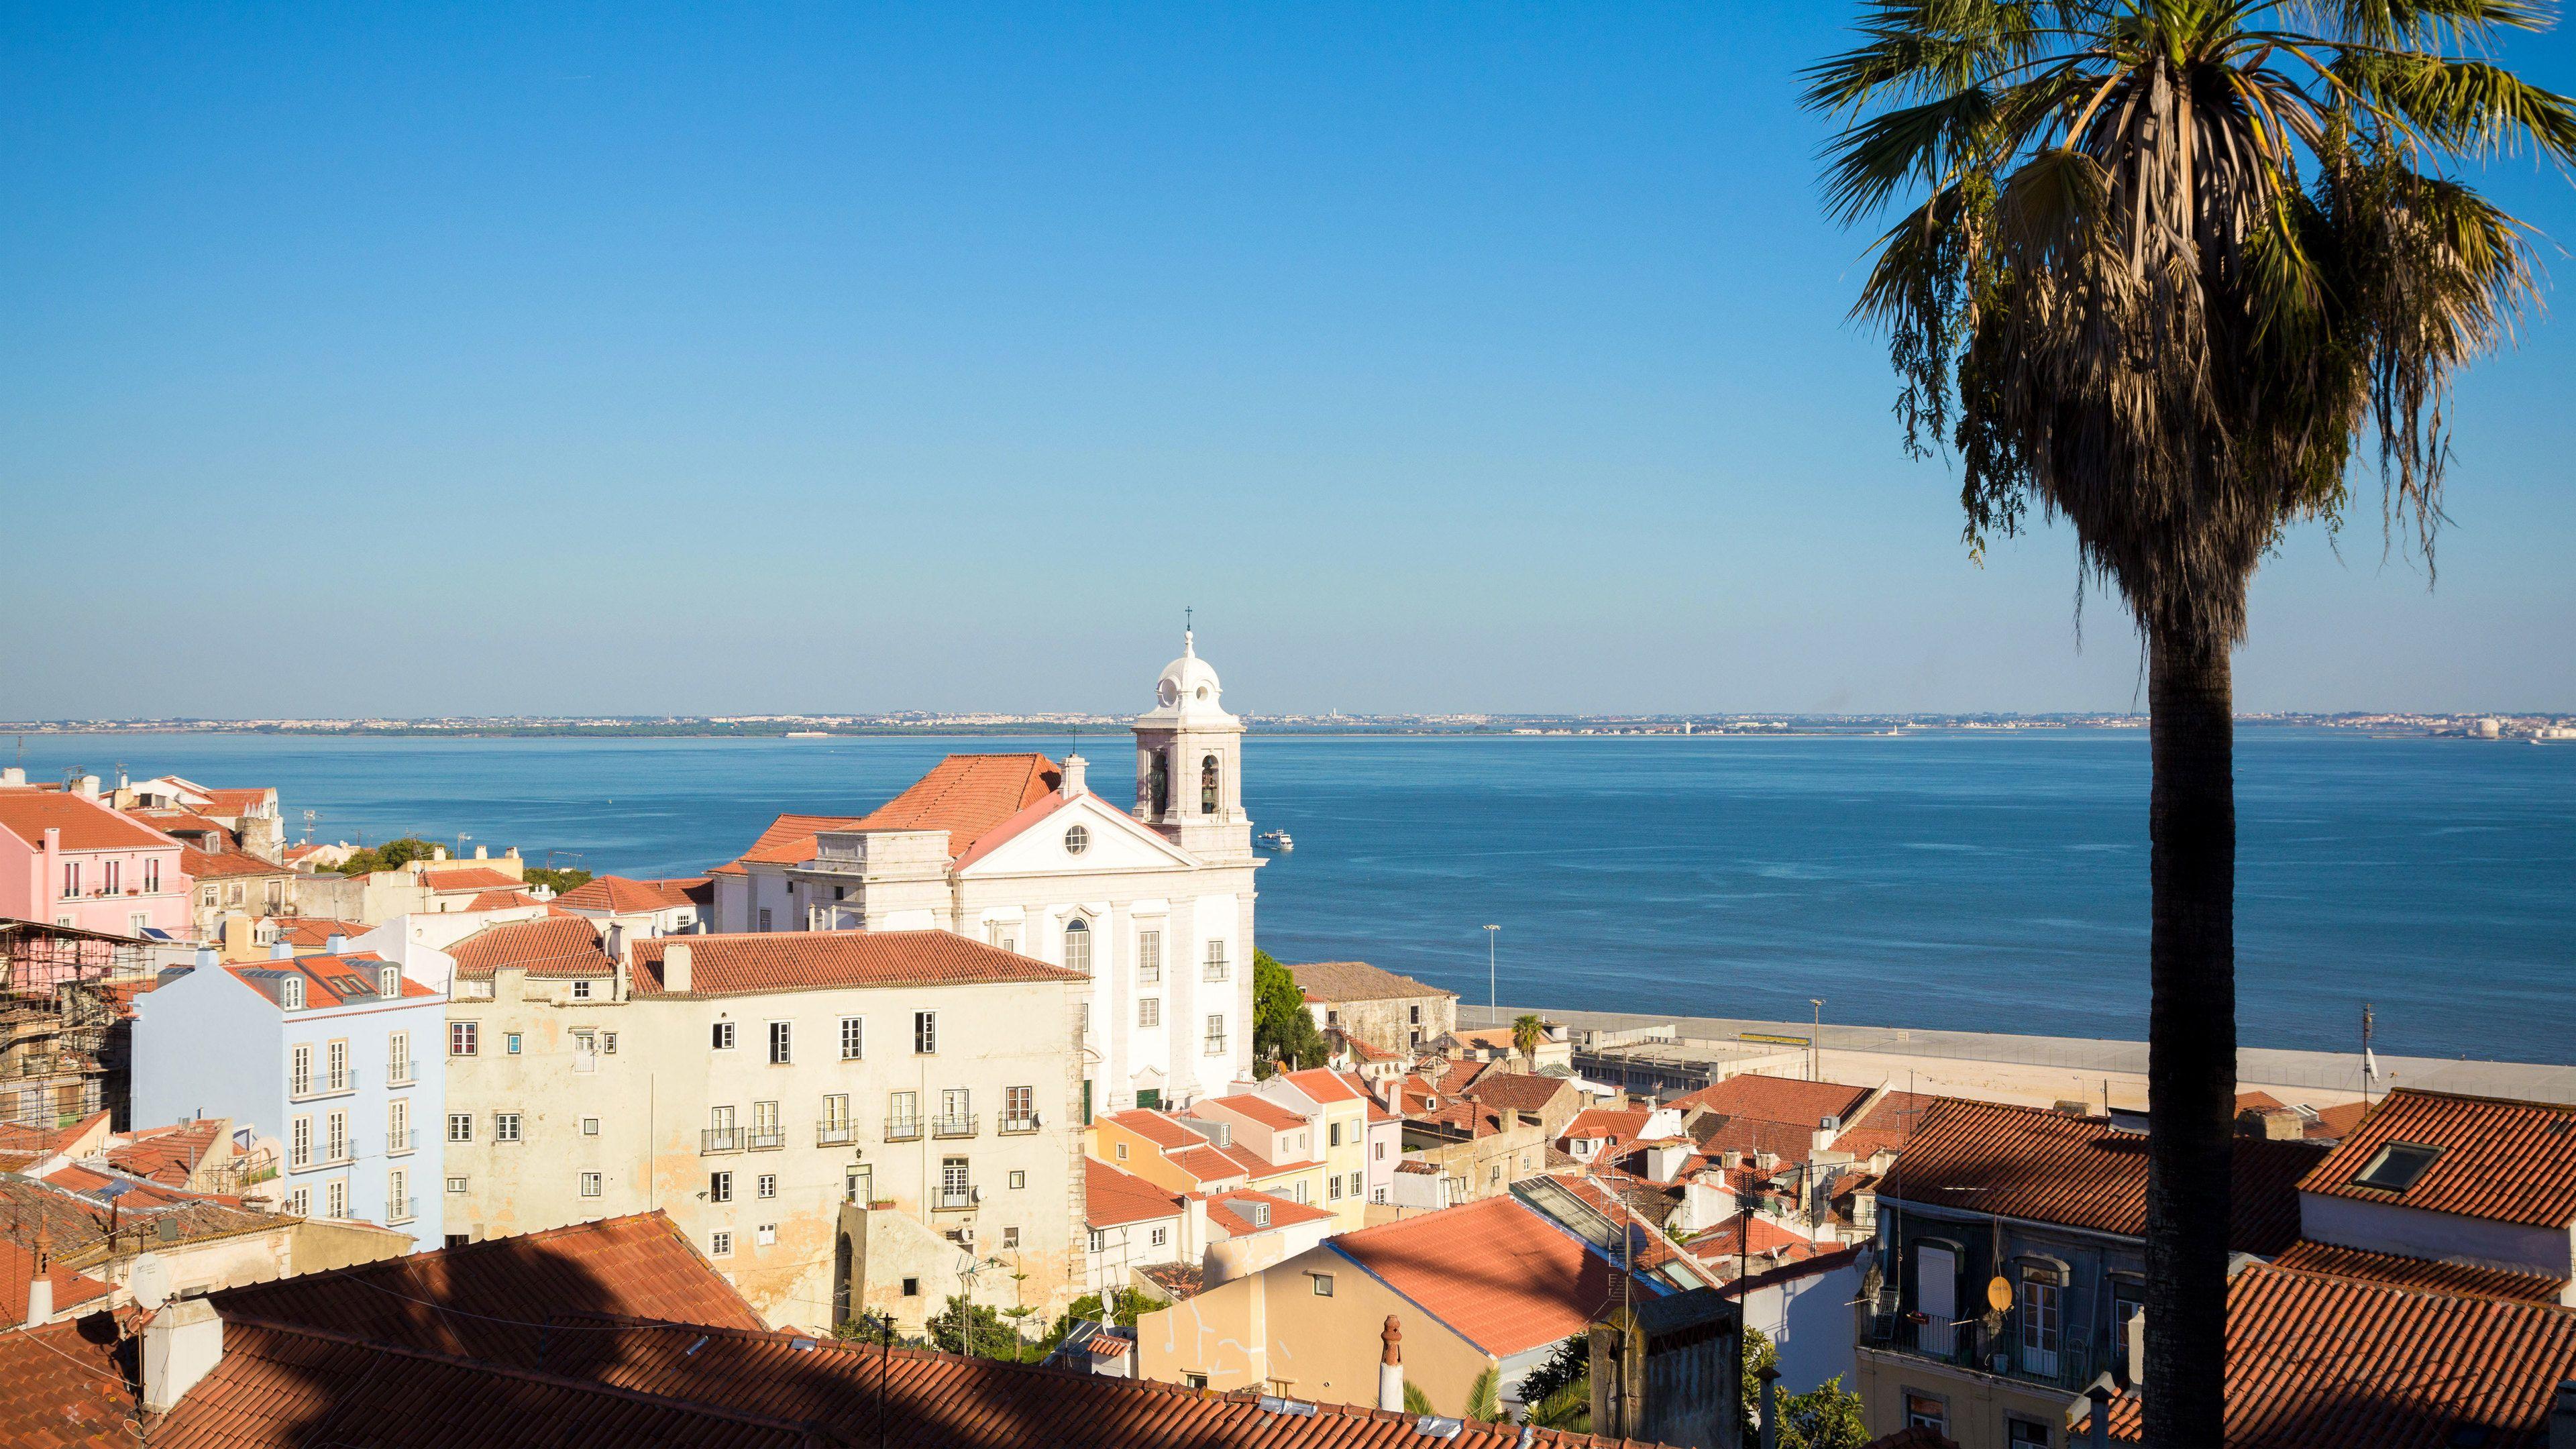 Alfama coastline in Lisbon